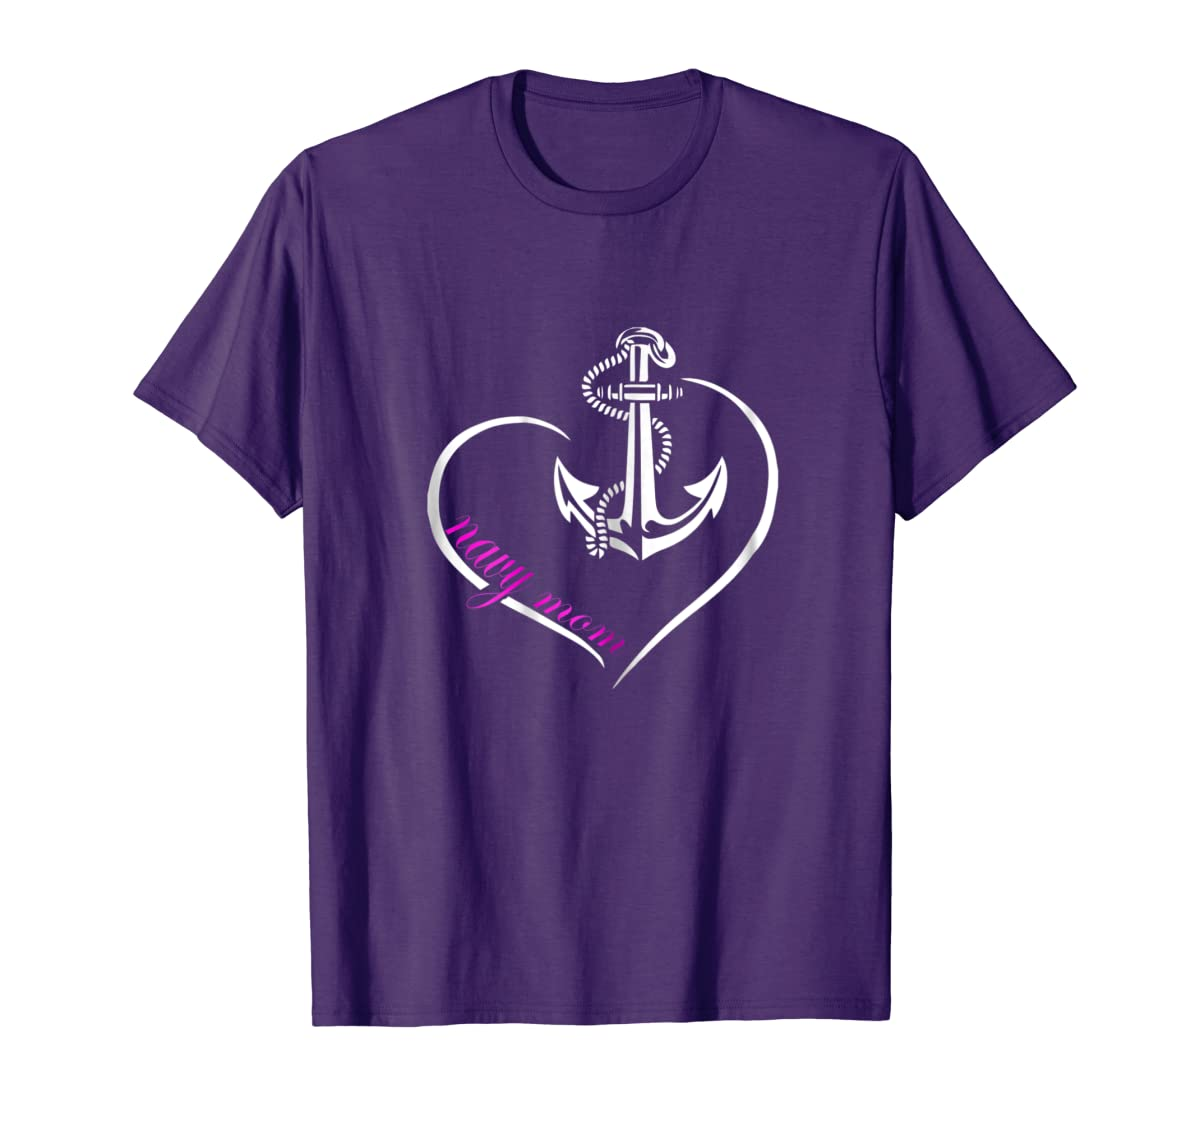 Womens U.S. NAVY SHIRT ORIGINAL PROUD NAVY MOM T-TSHIRT-Men's T-Shirt-Purple